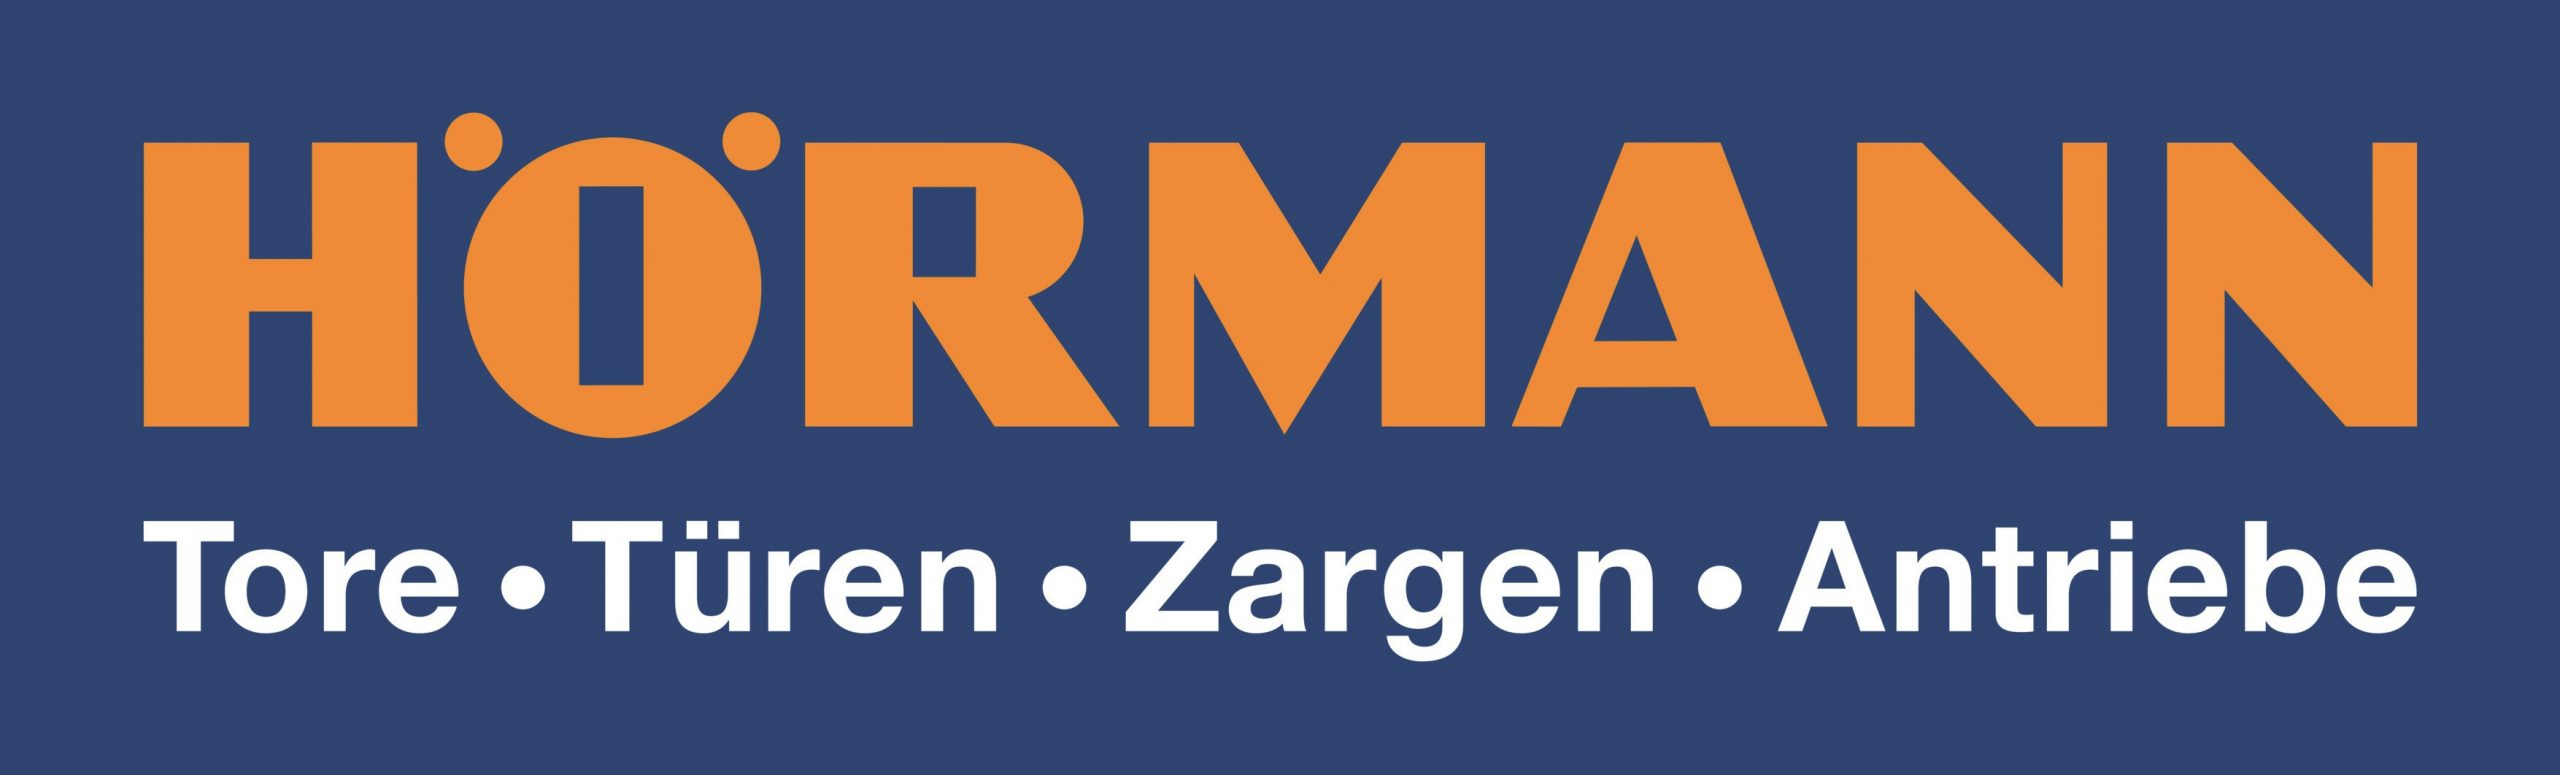 Wortmarke Hörmann